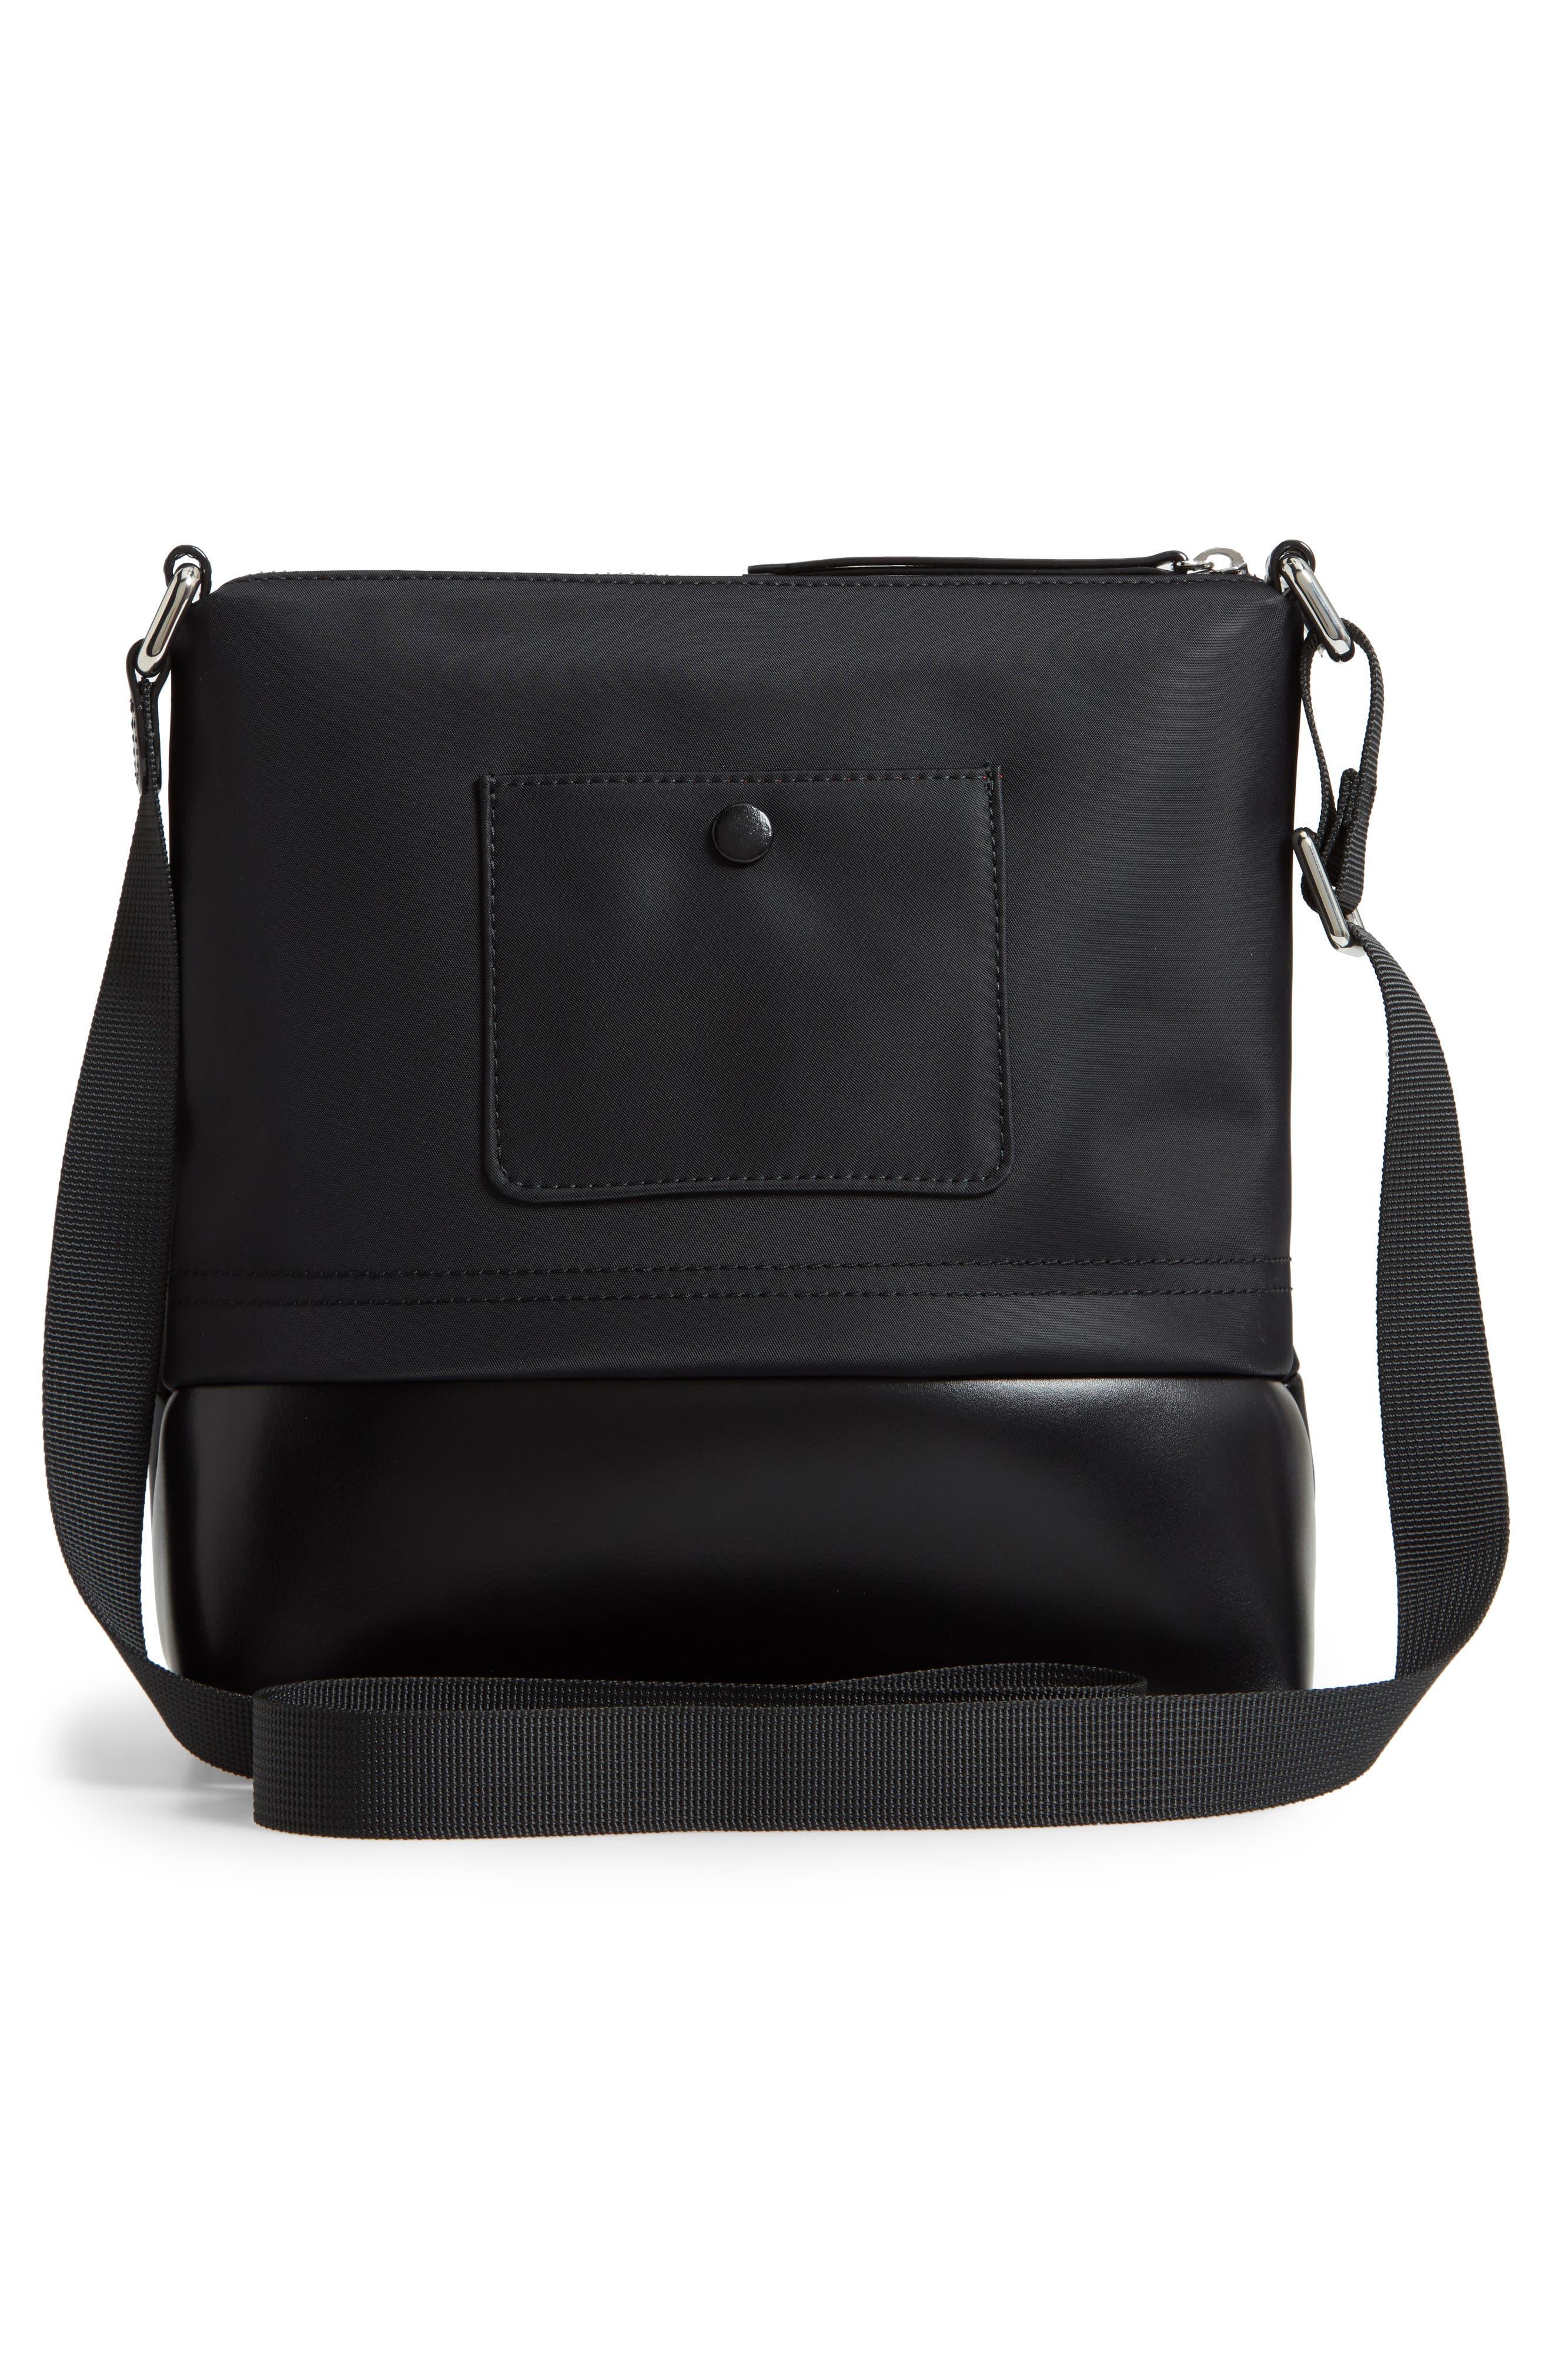 Wanda Nylon Sport RFID Travel Crossbody Bag,                             Alternate thumbnail 3, color,                             BLACK